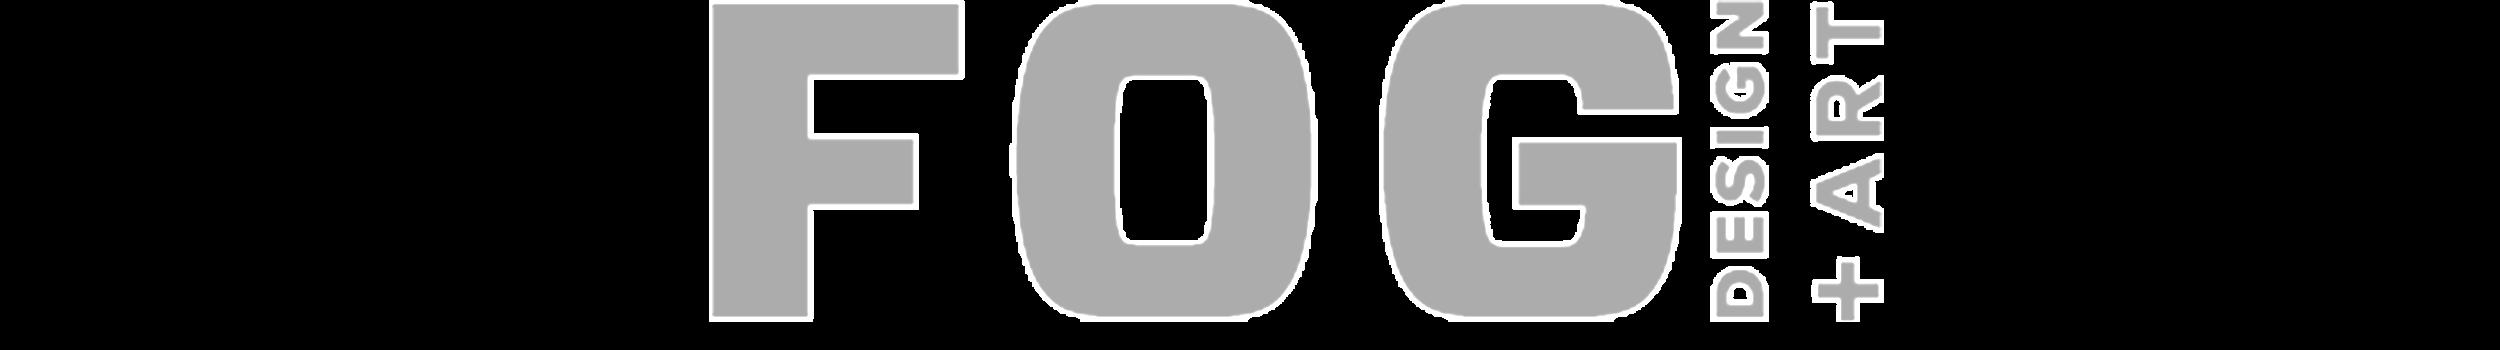 fog_logo